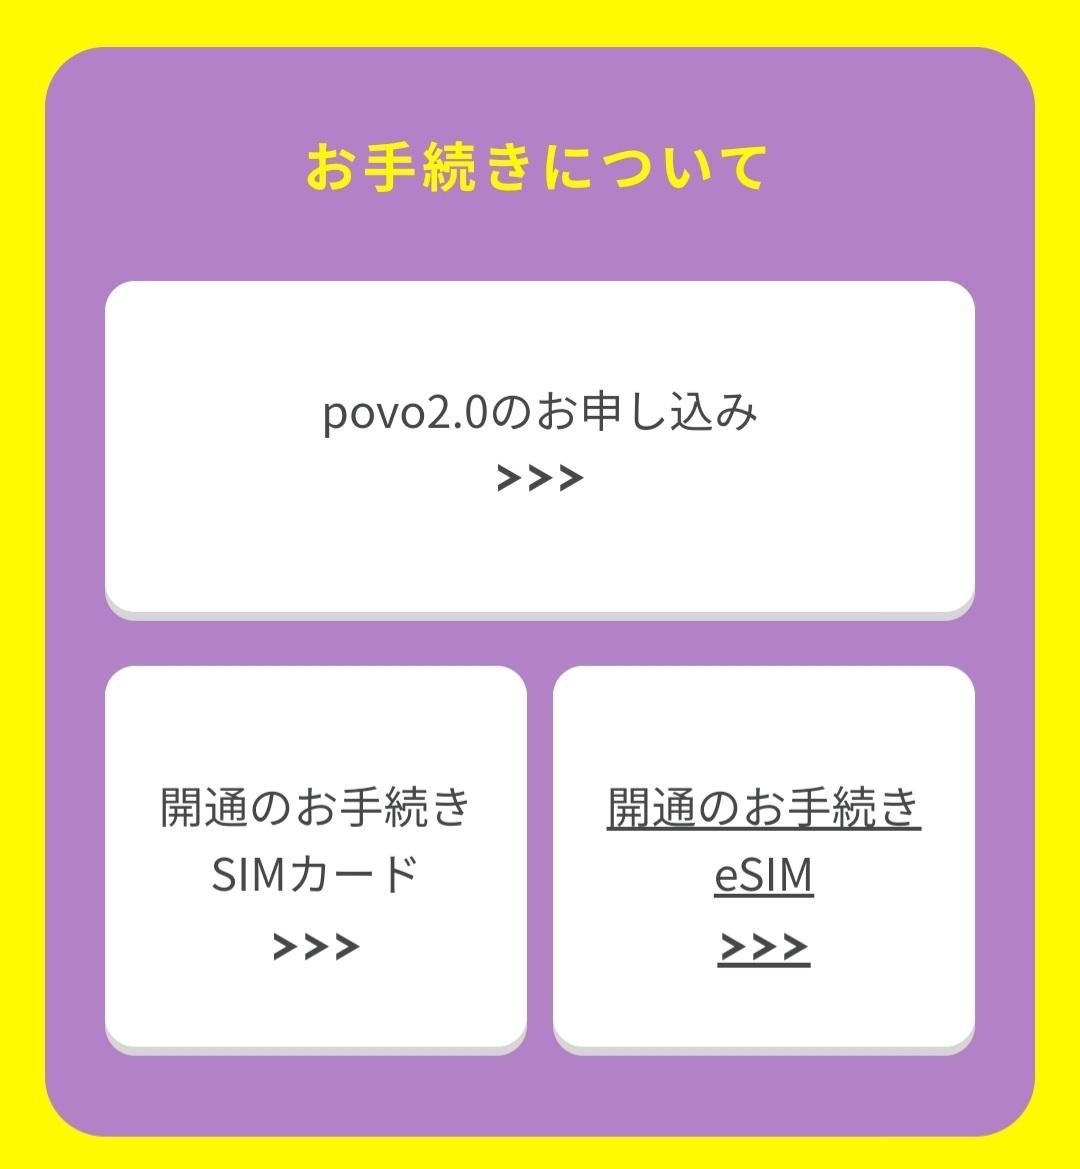 f:id:jjyy:20211002005543j:plain